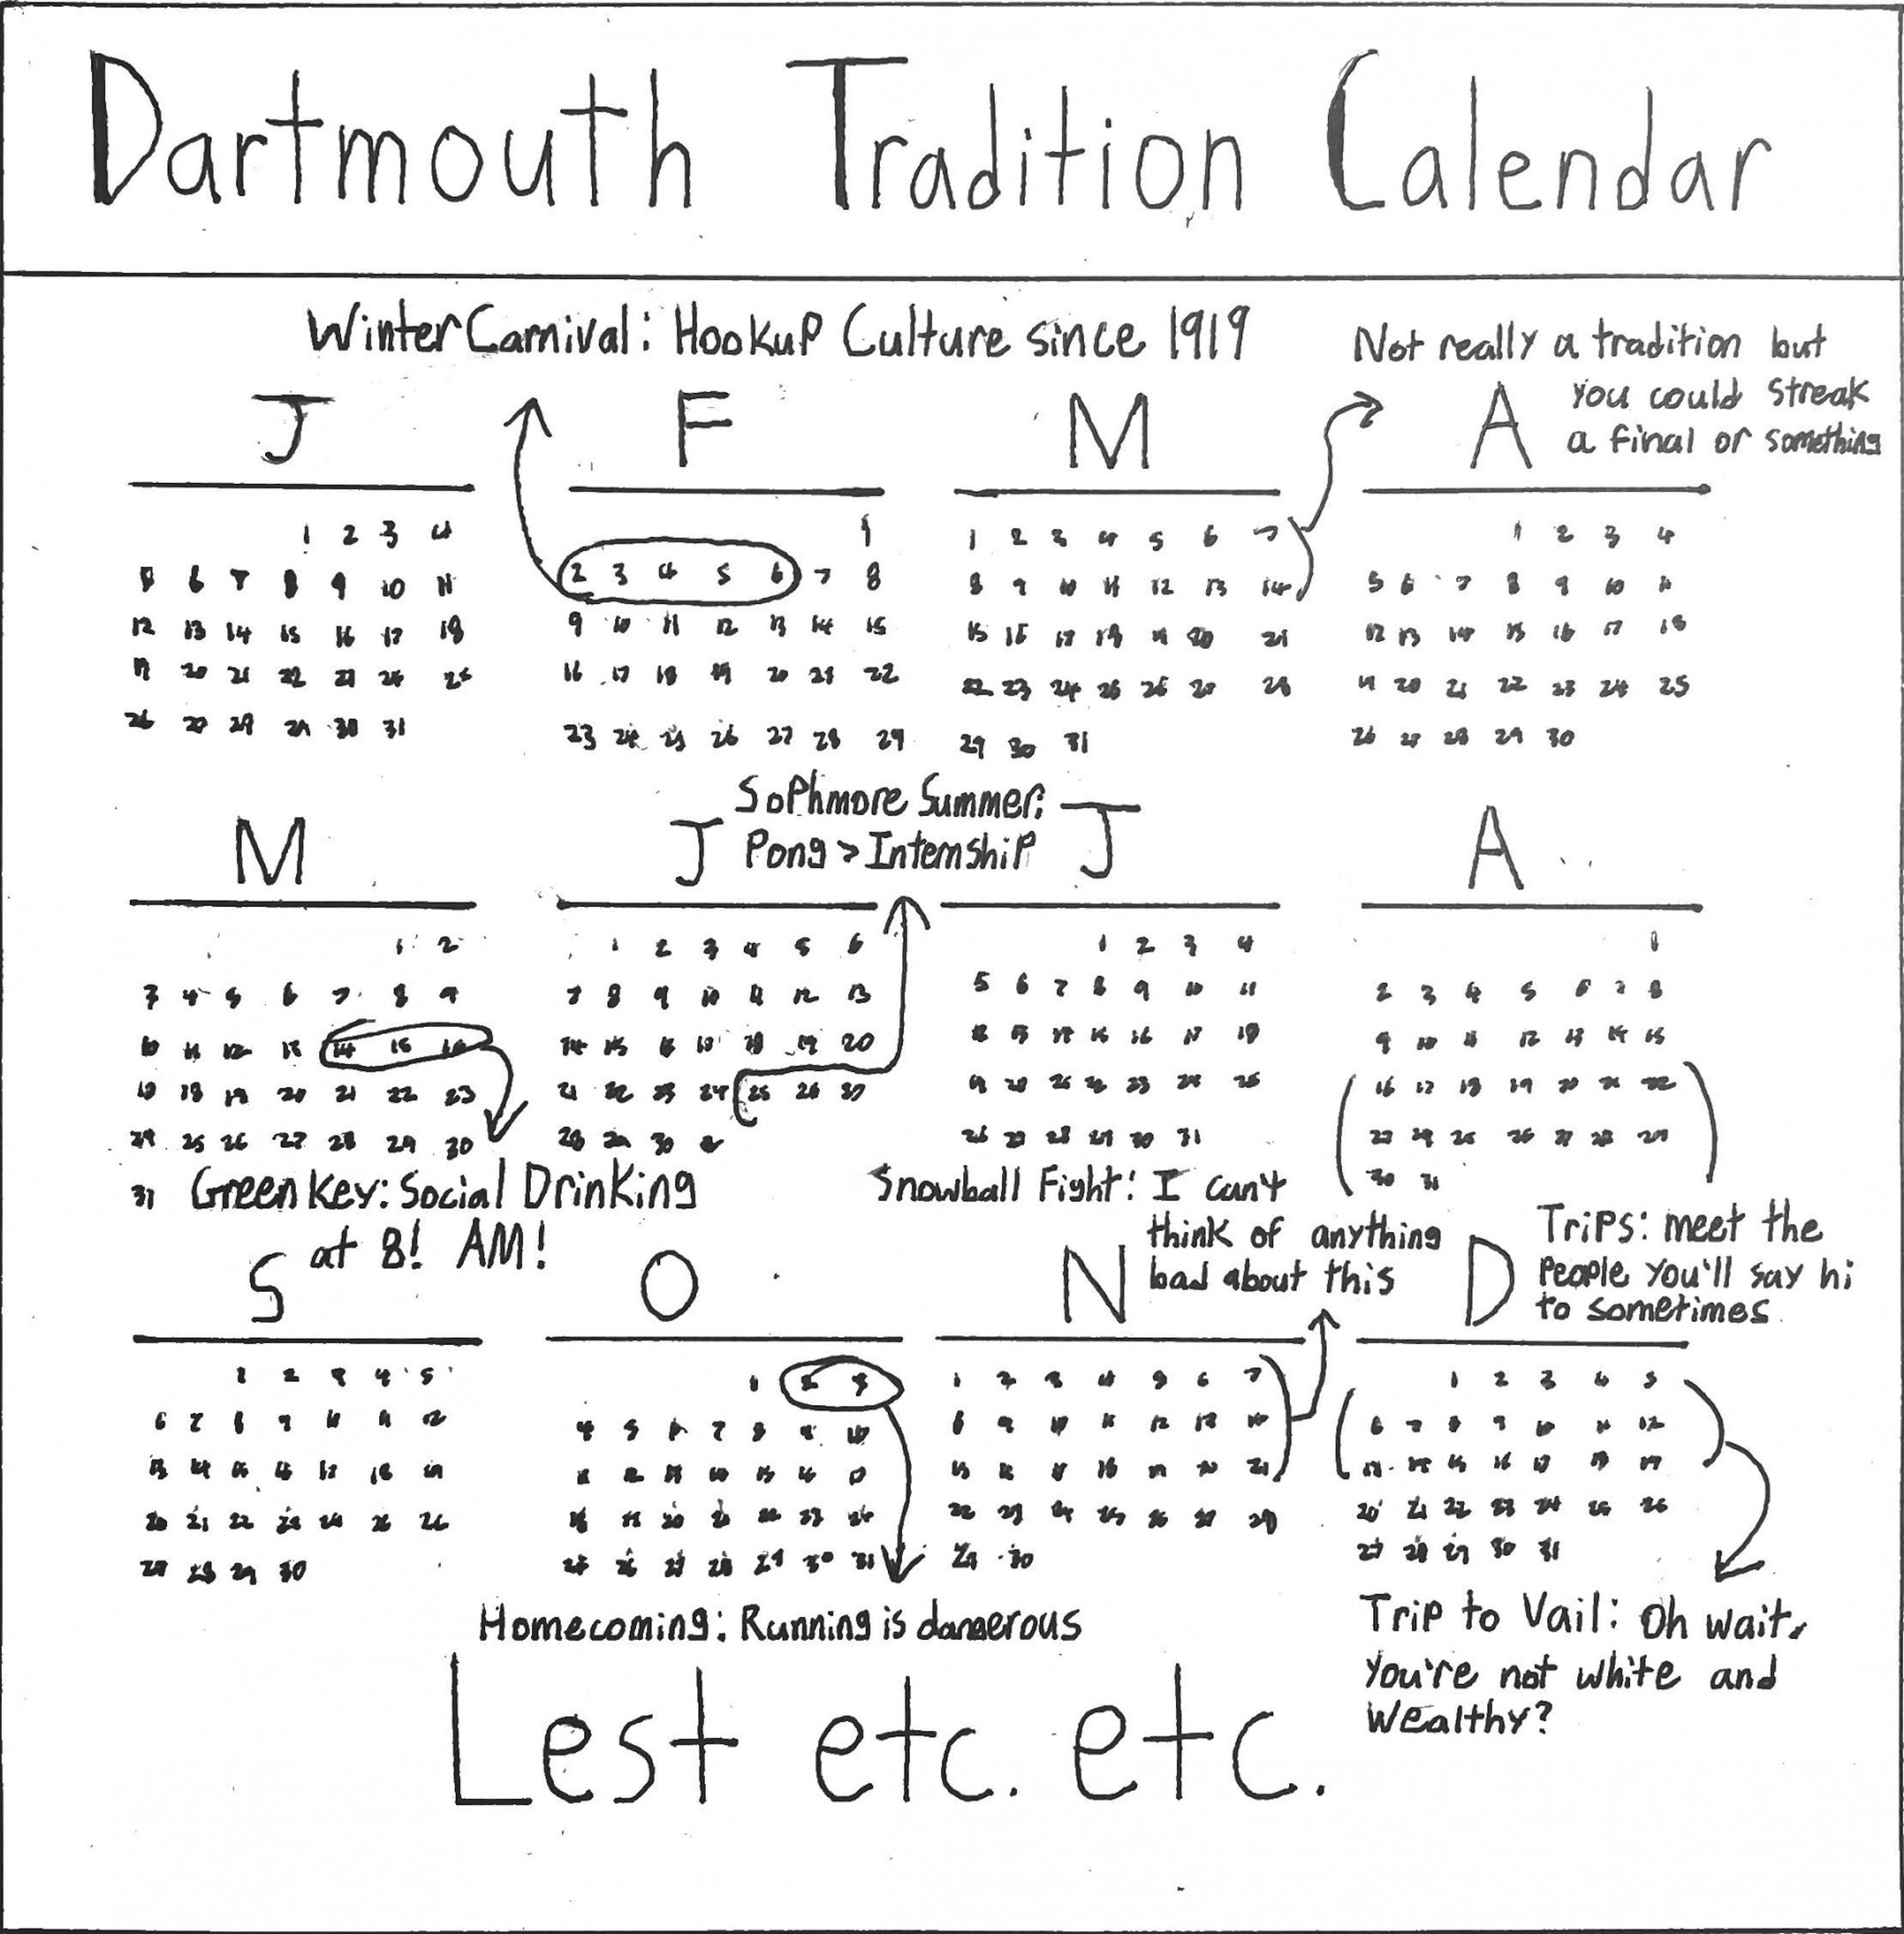 a-dartmouth-year